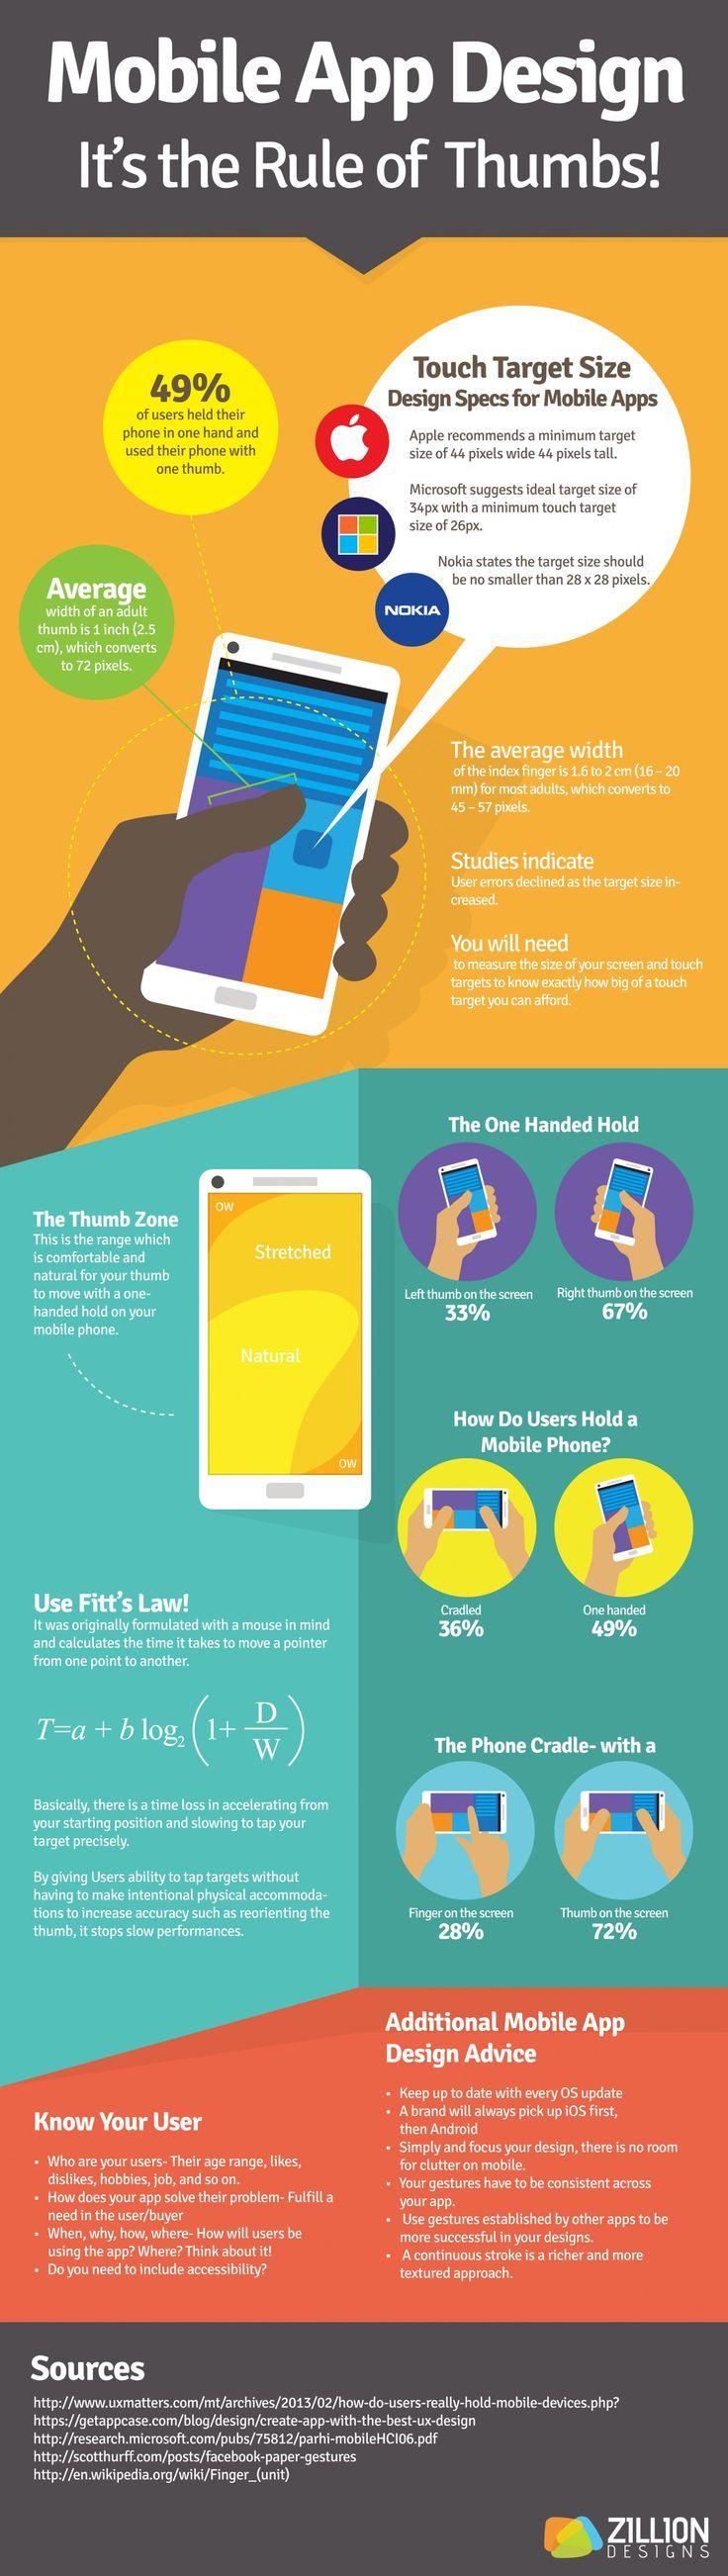 mobile app design rule of thumb